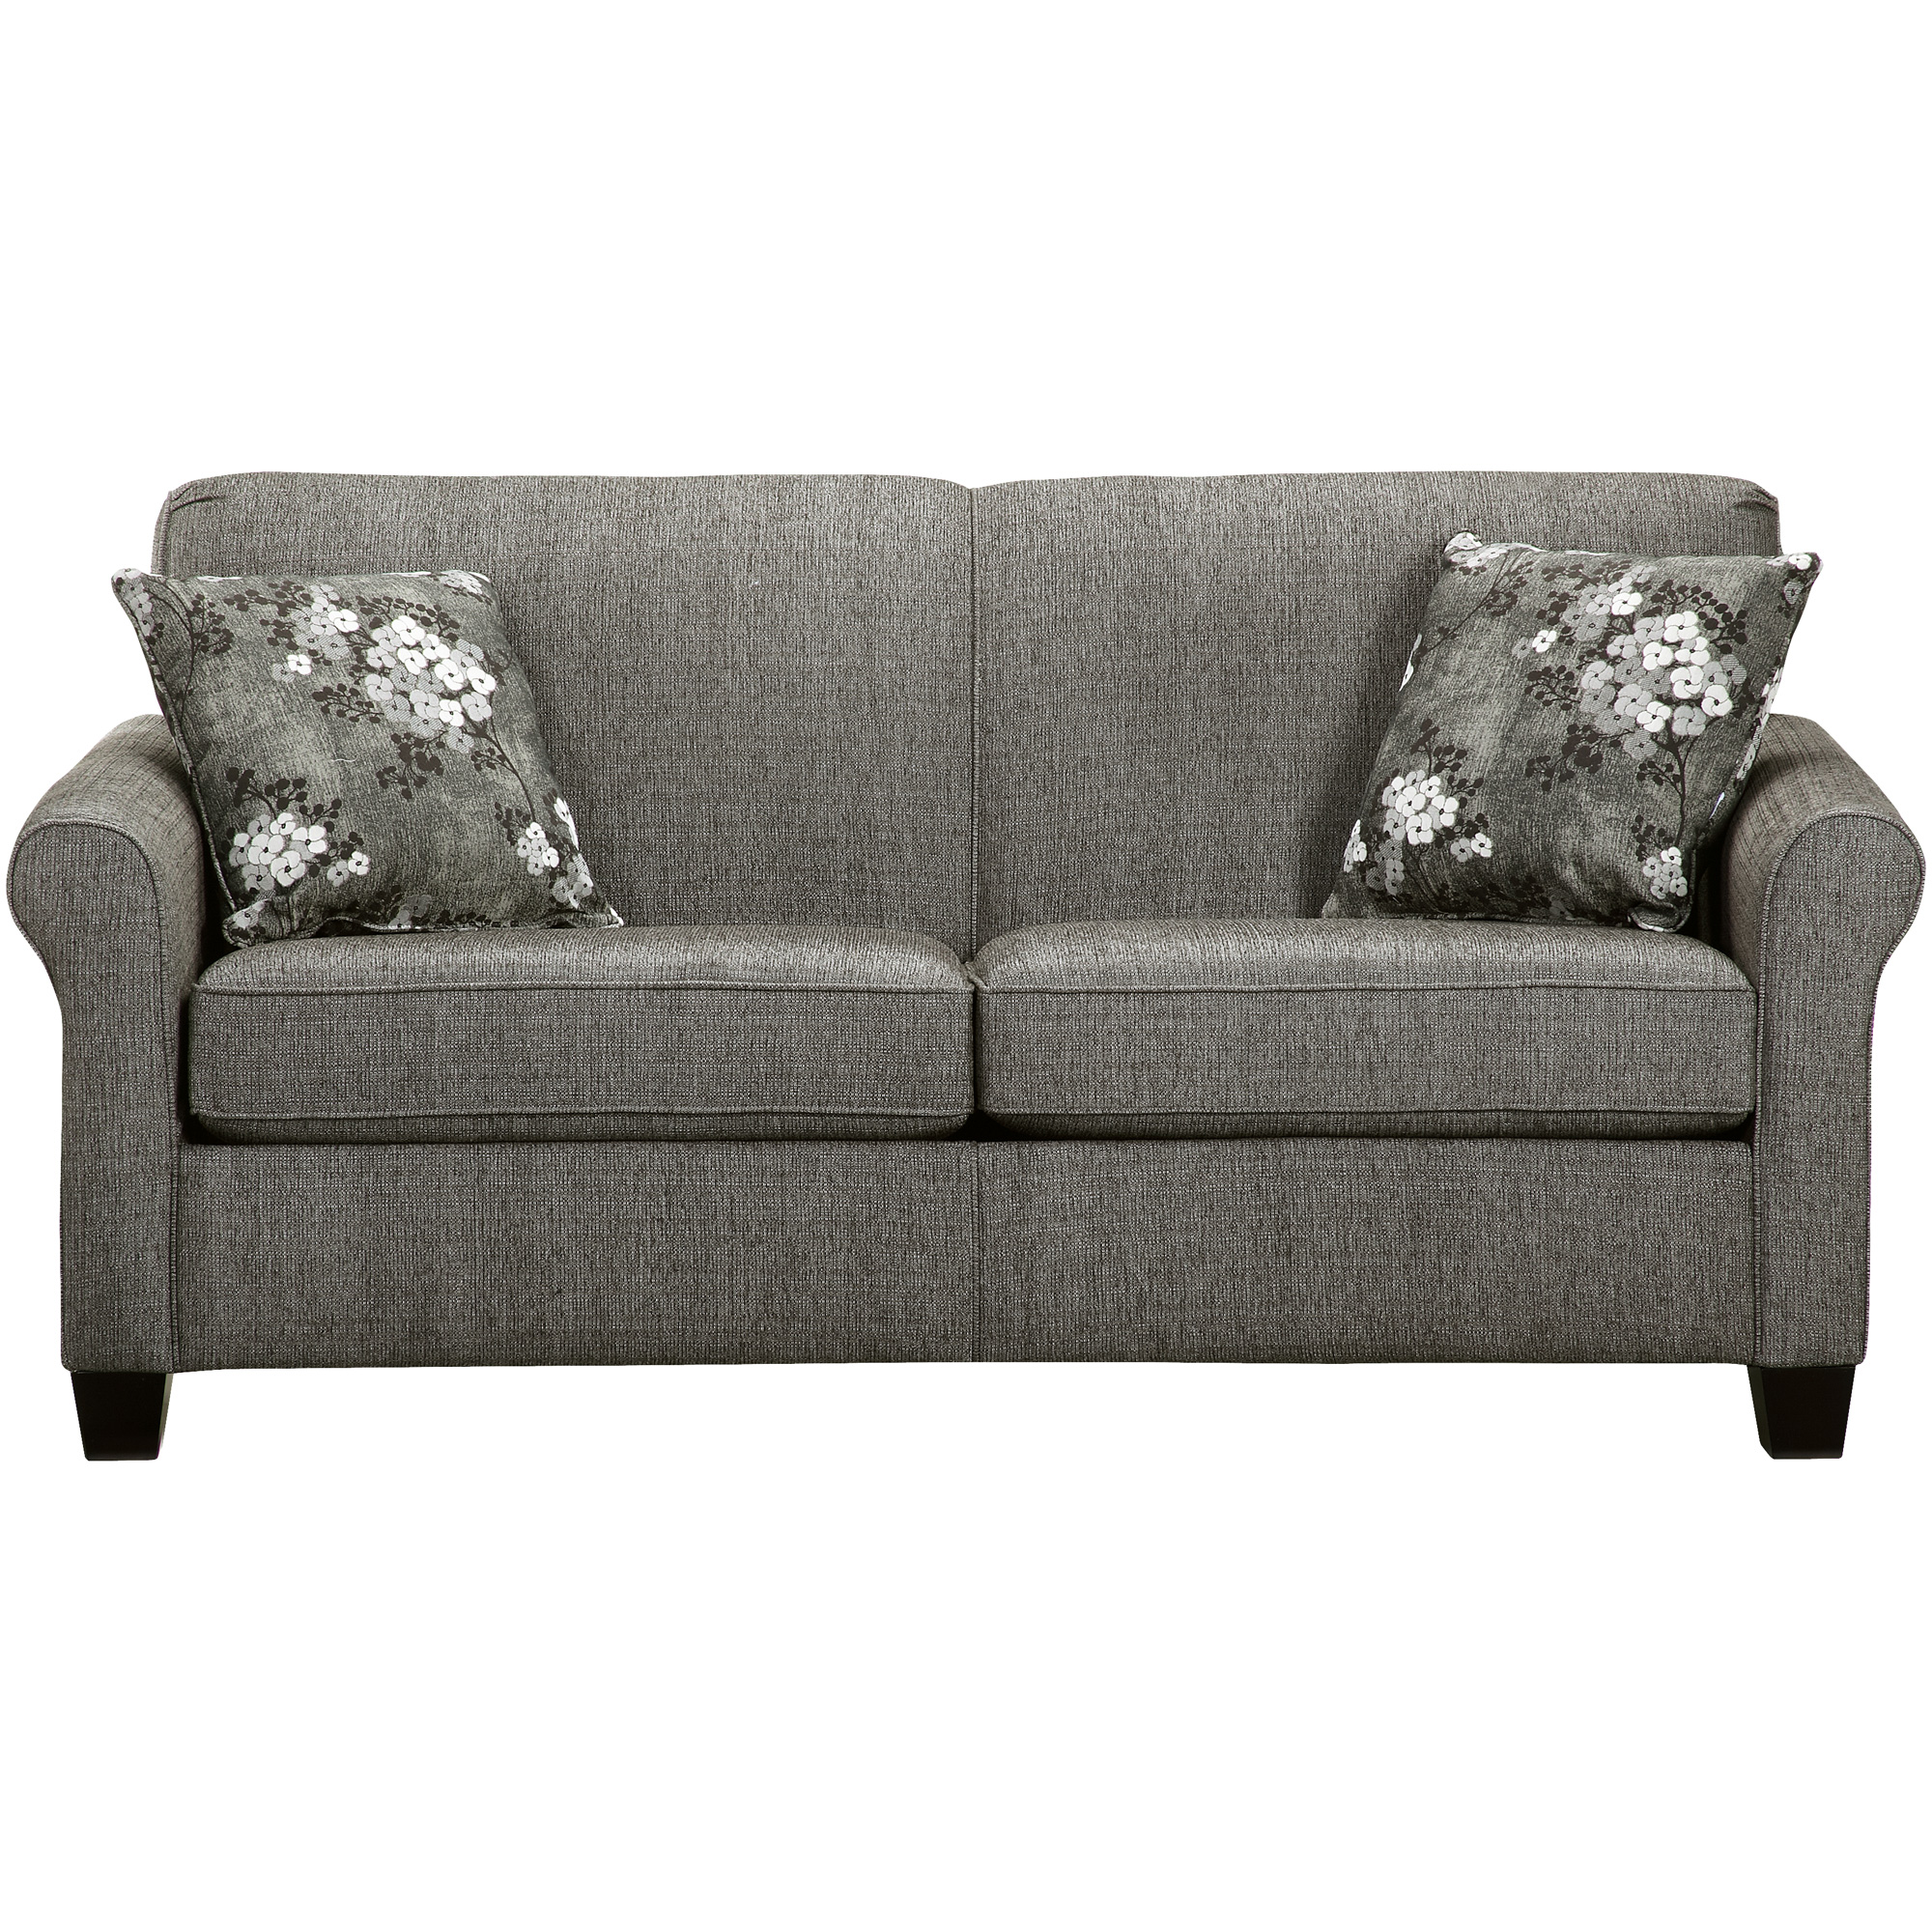 Dimensions By England | York Granite Full Sleeper Sofa